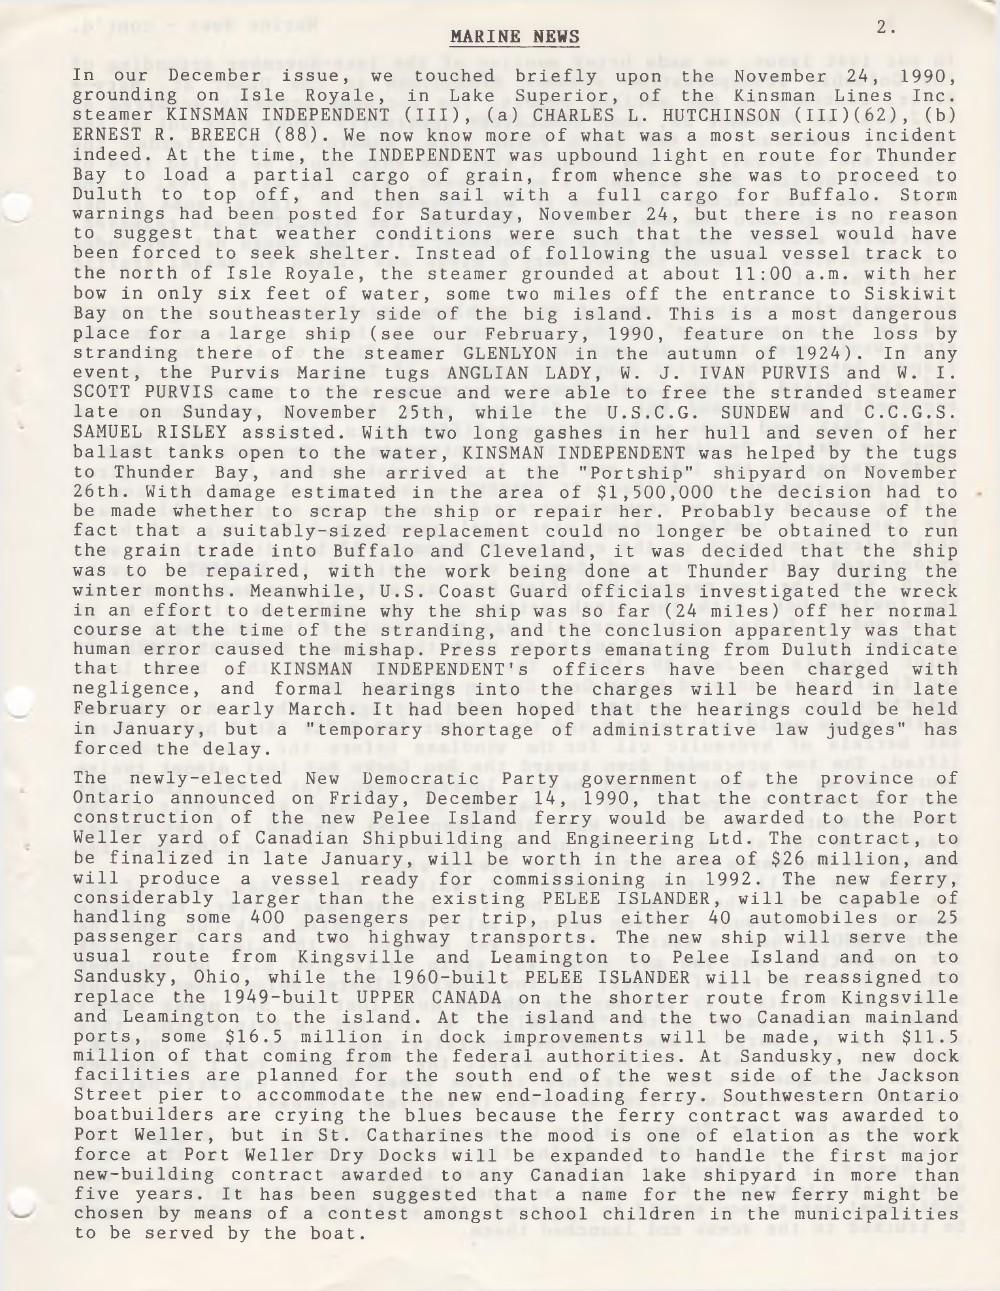 Scanner, v. 23, no. 4 (January 1991)